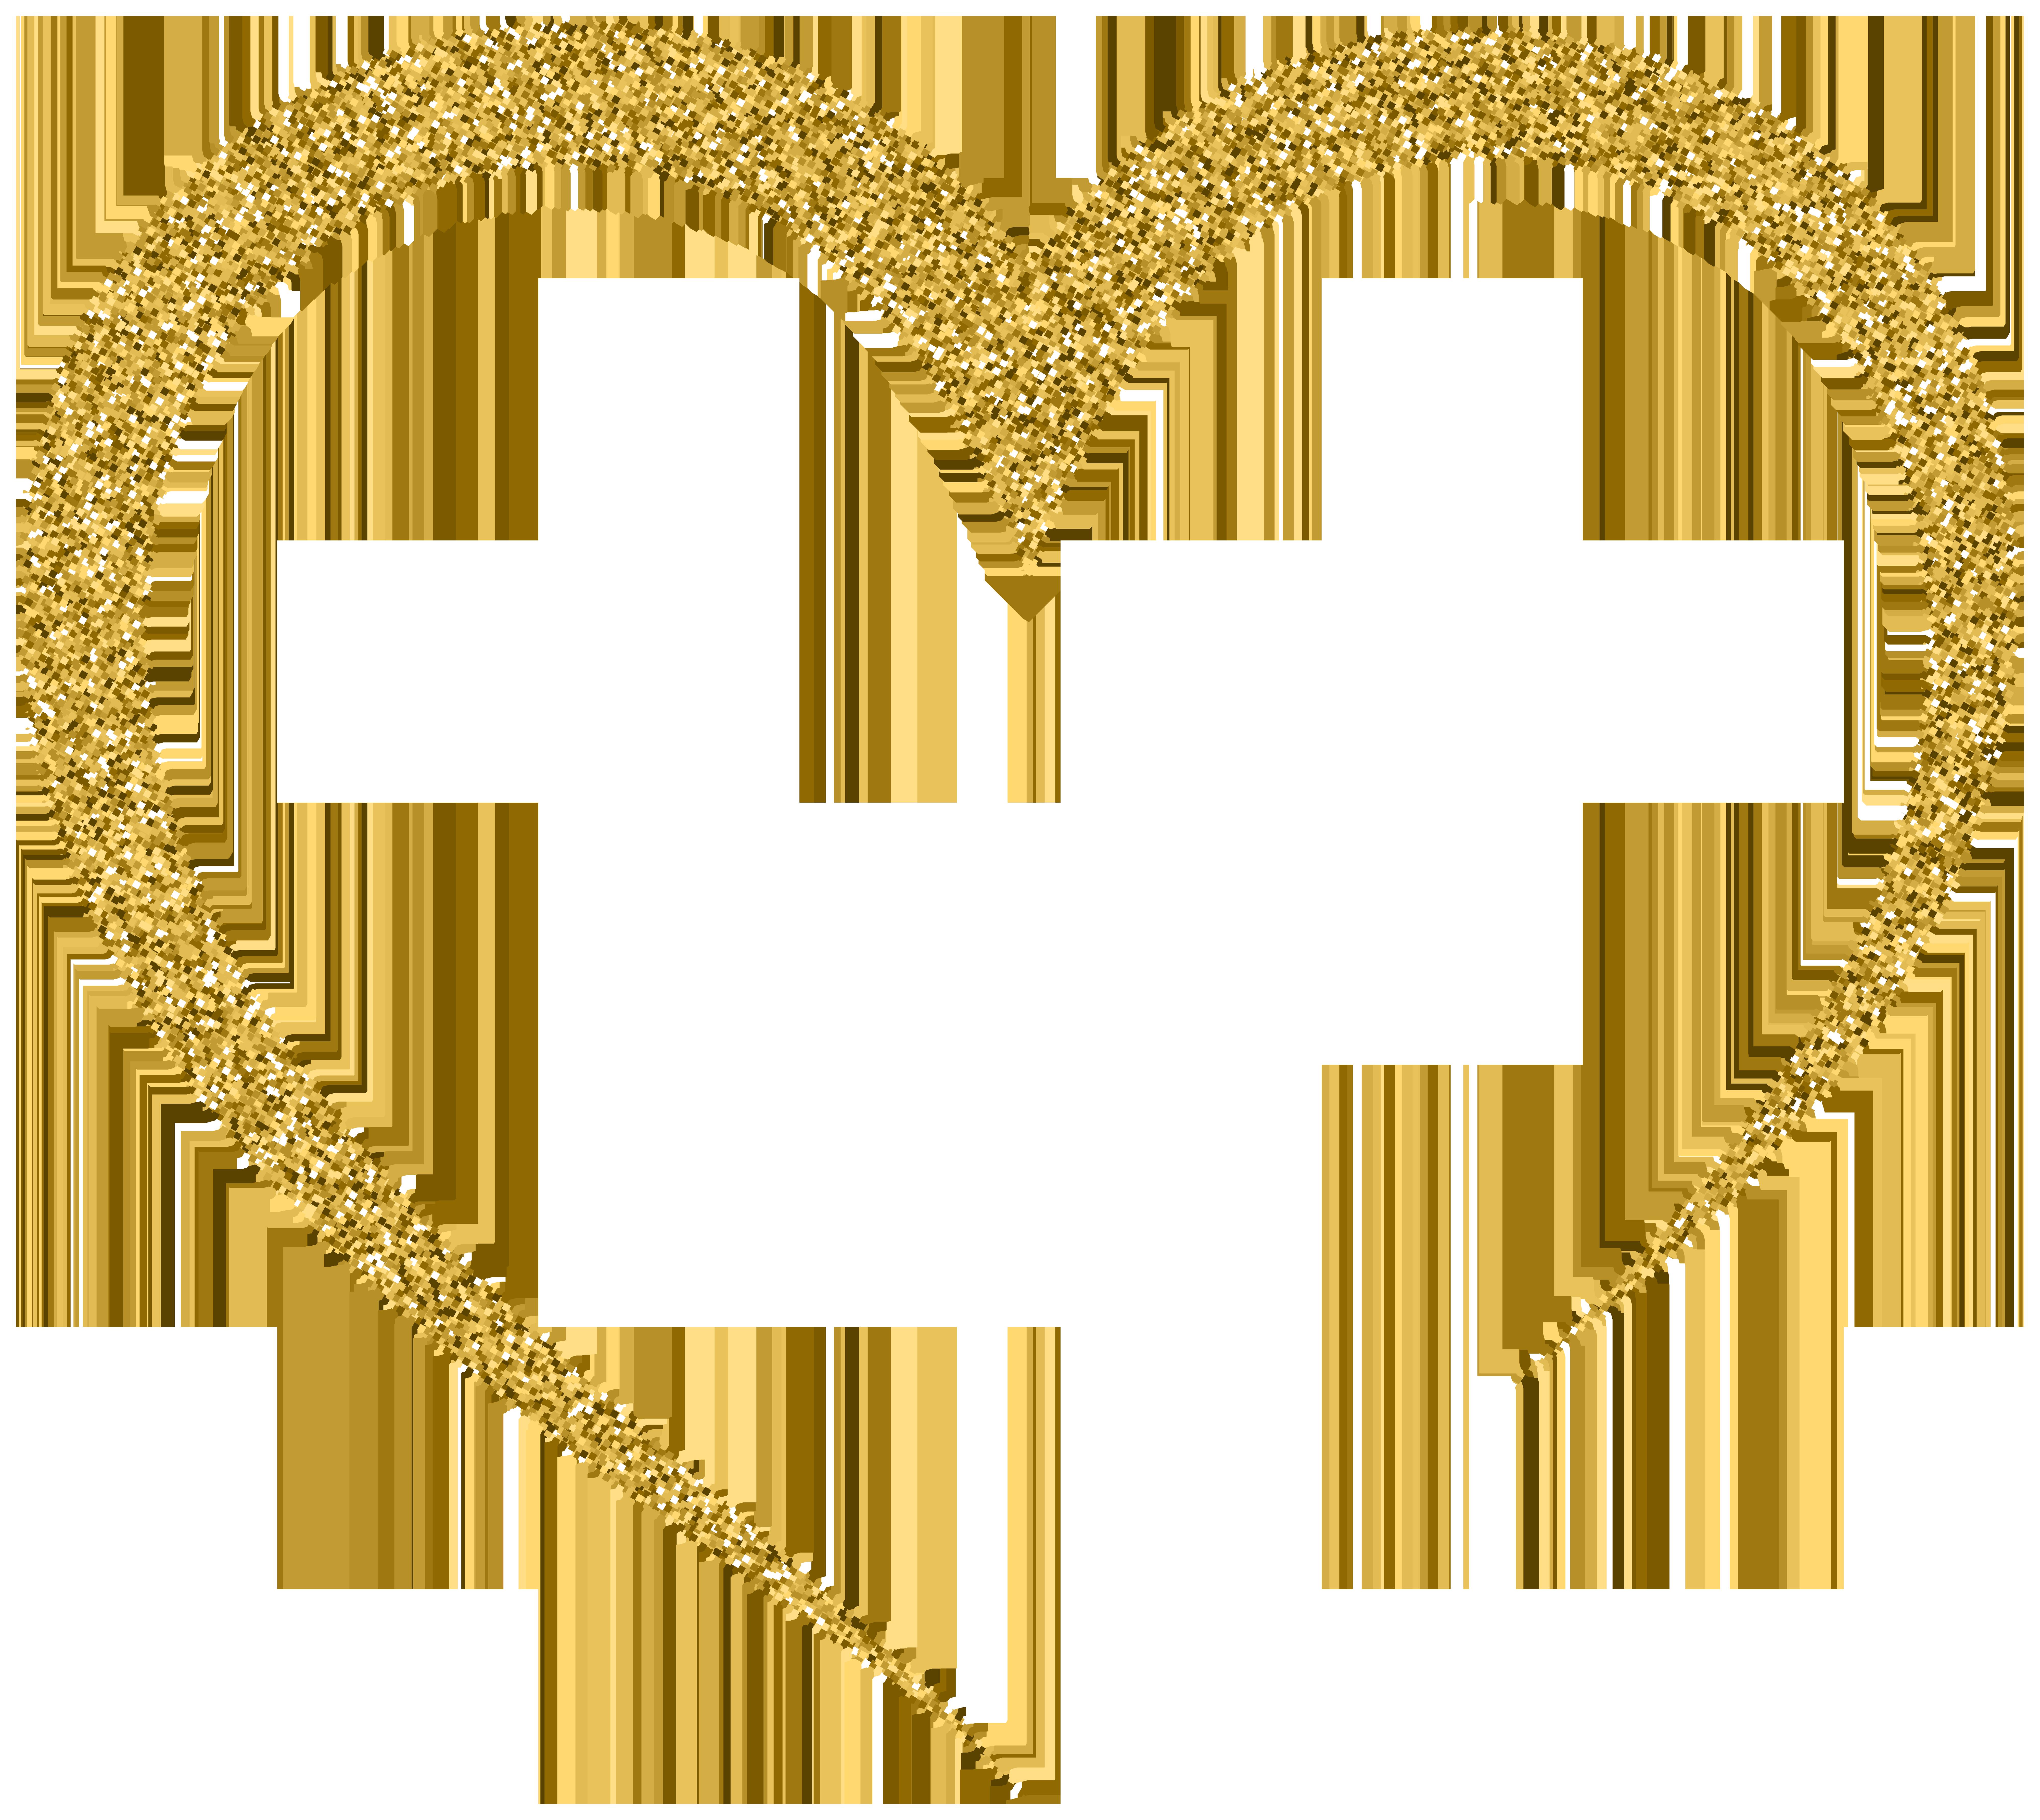 Cliparts heart gold clipart transparent download Heart Gold Decorative Transparent Image   Gallery Yopriceville ... clipart transparent download